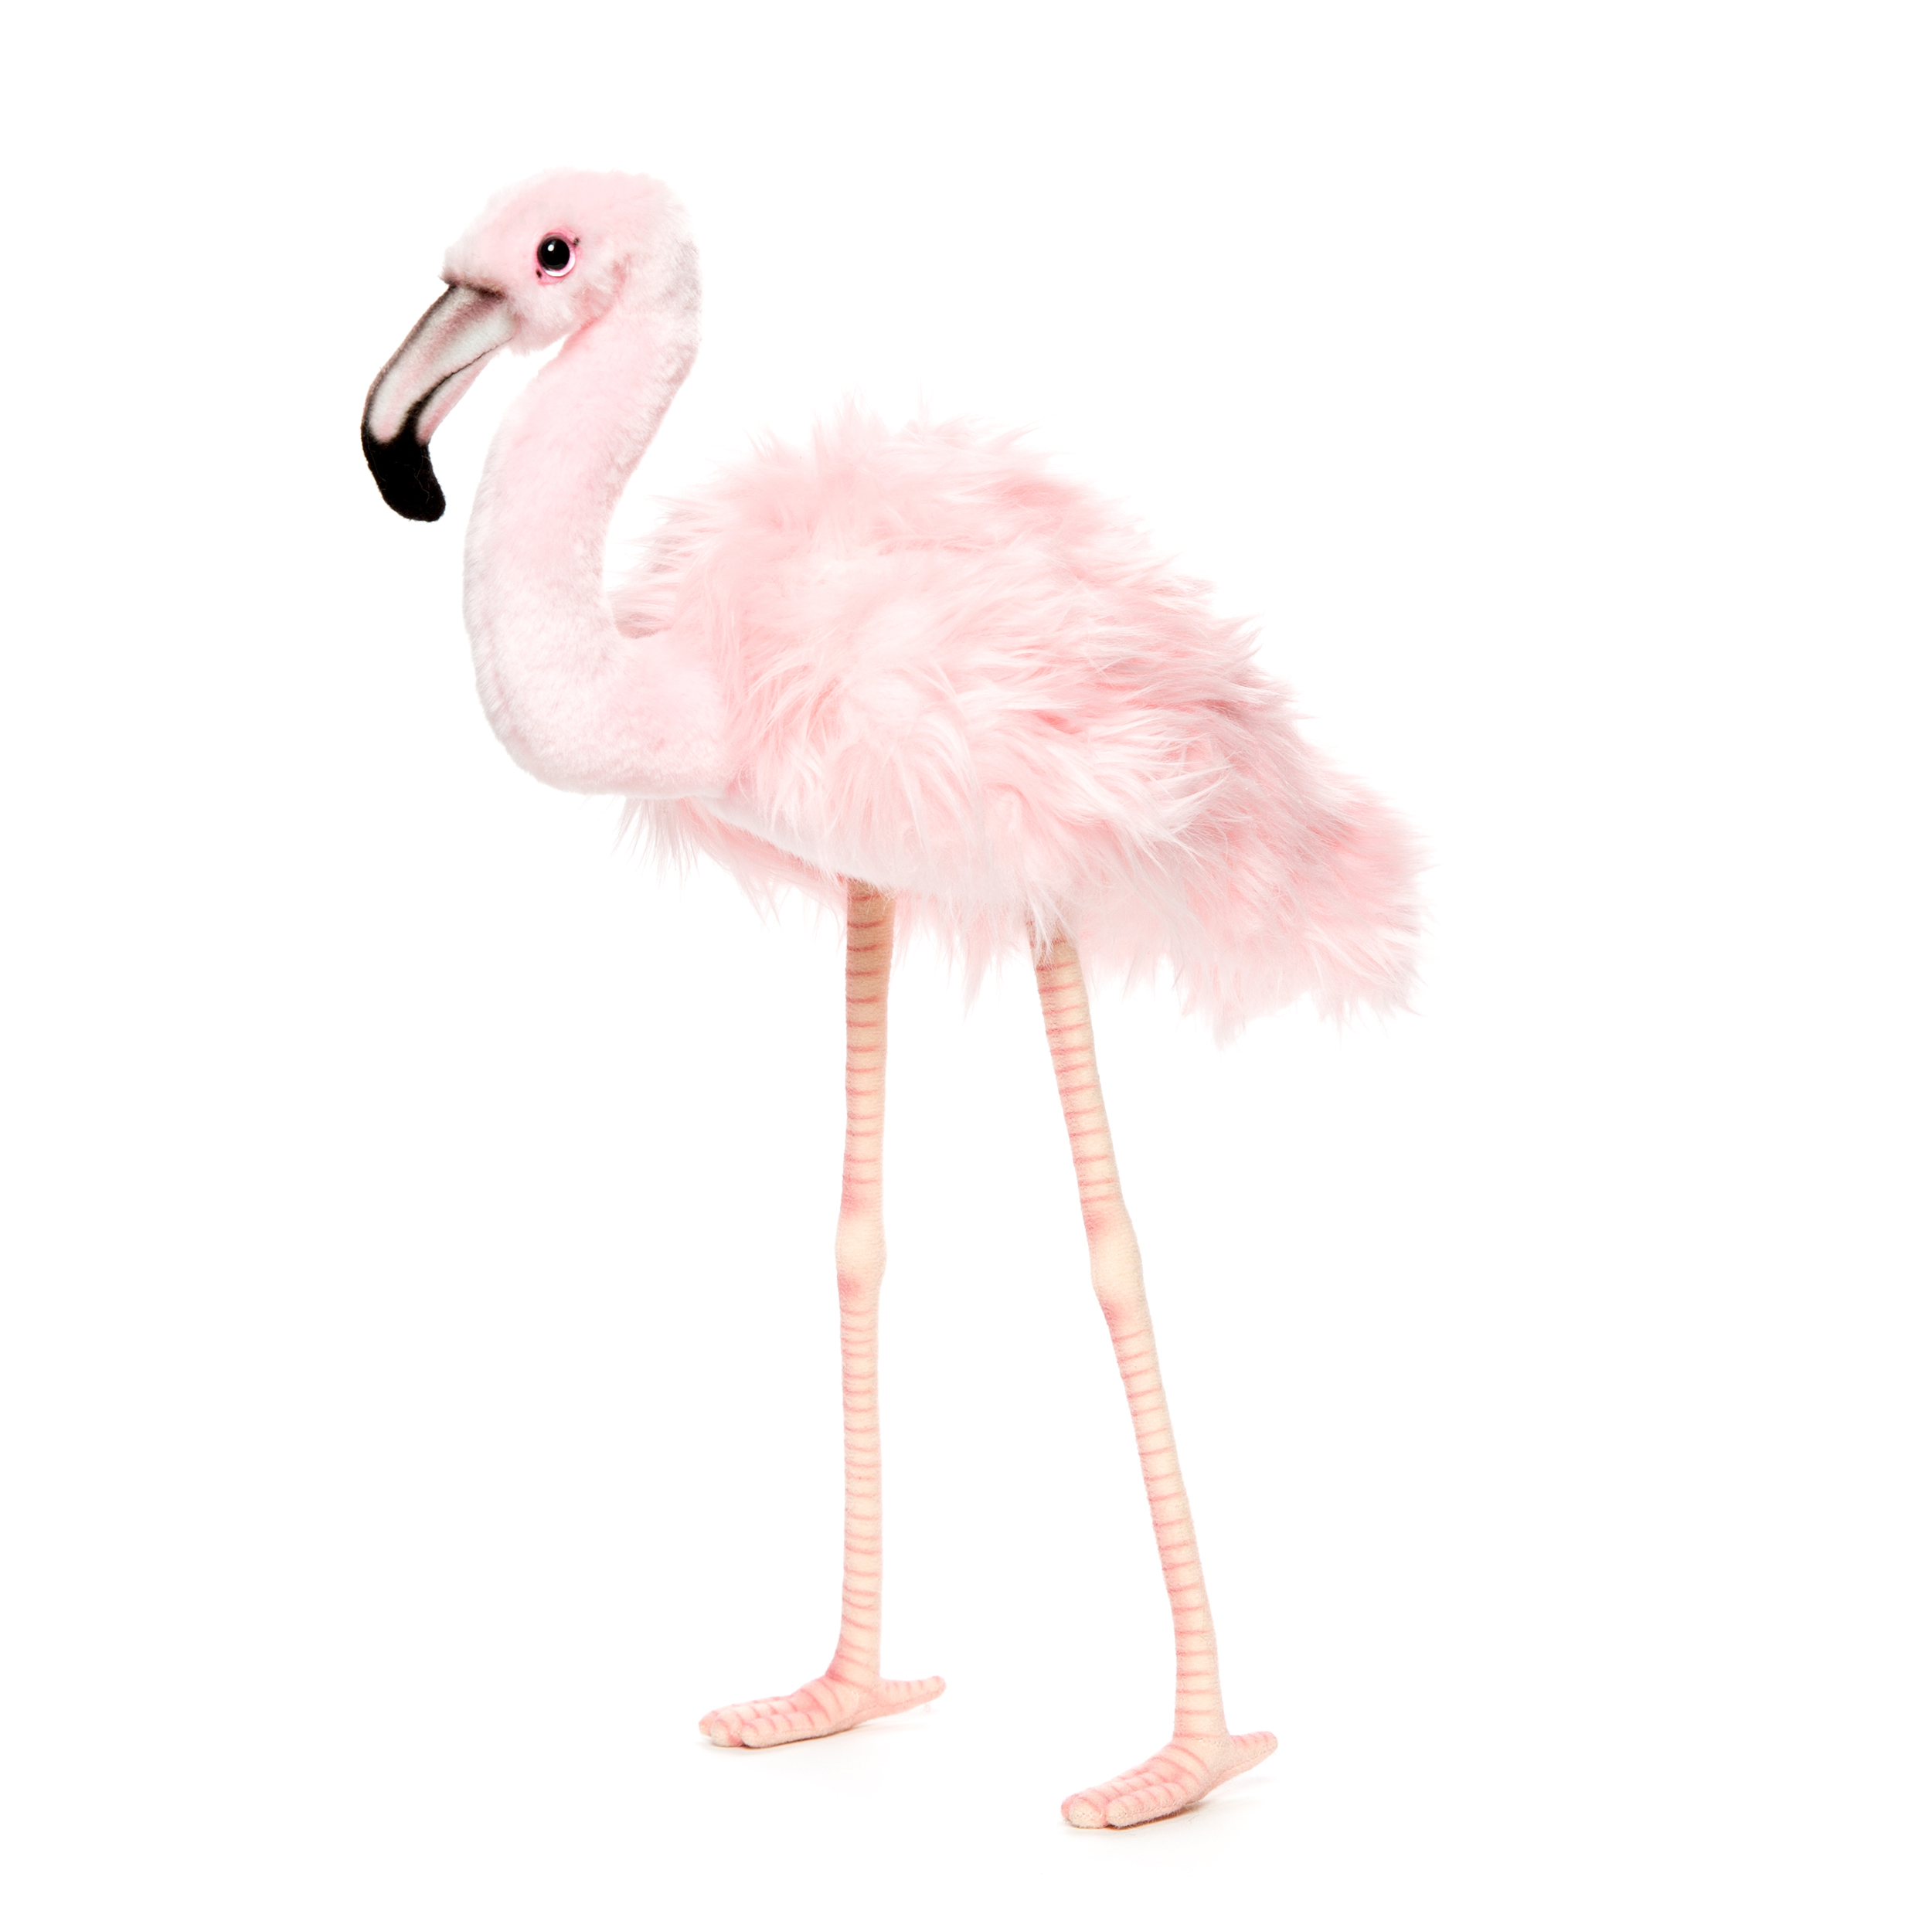 Roze Flamingo Roze Decoratie 38 Cm Levensechte Pluche Dieren Hansa Creation Benelux